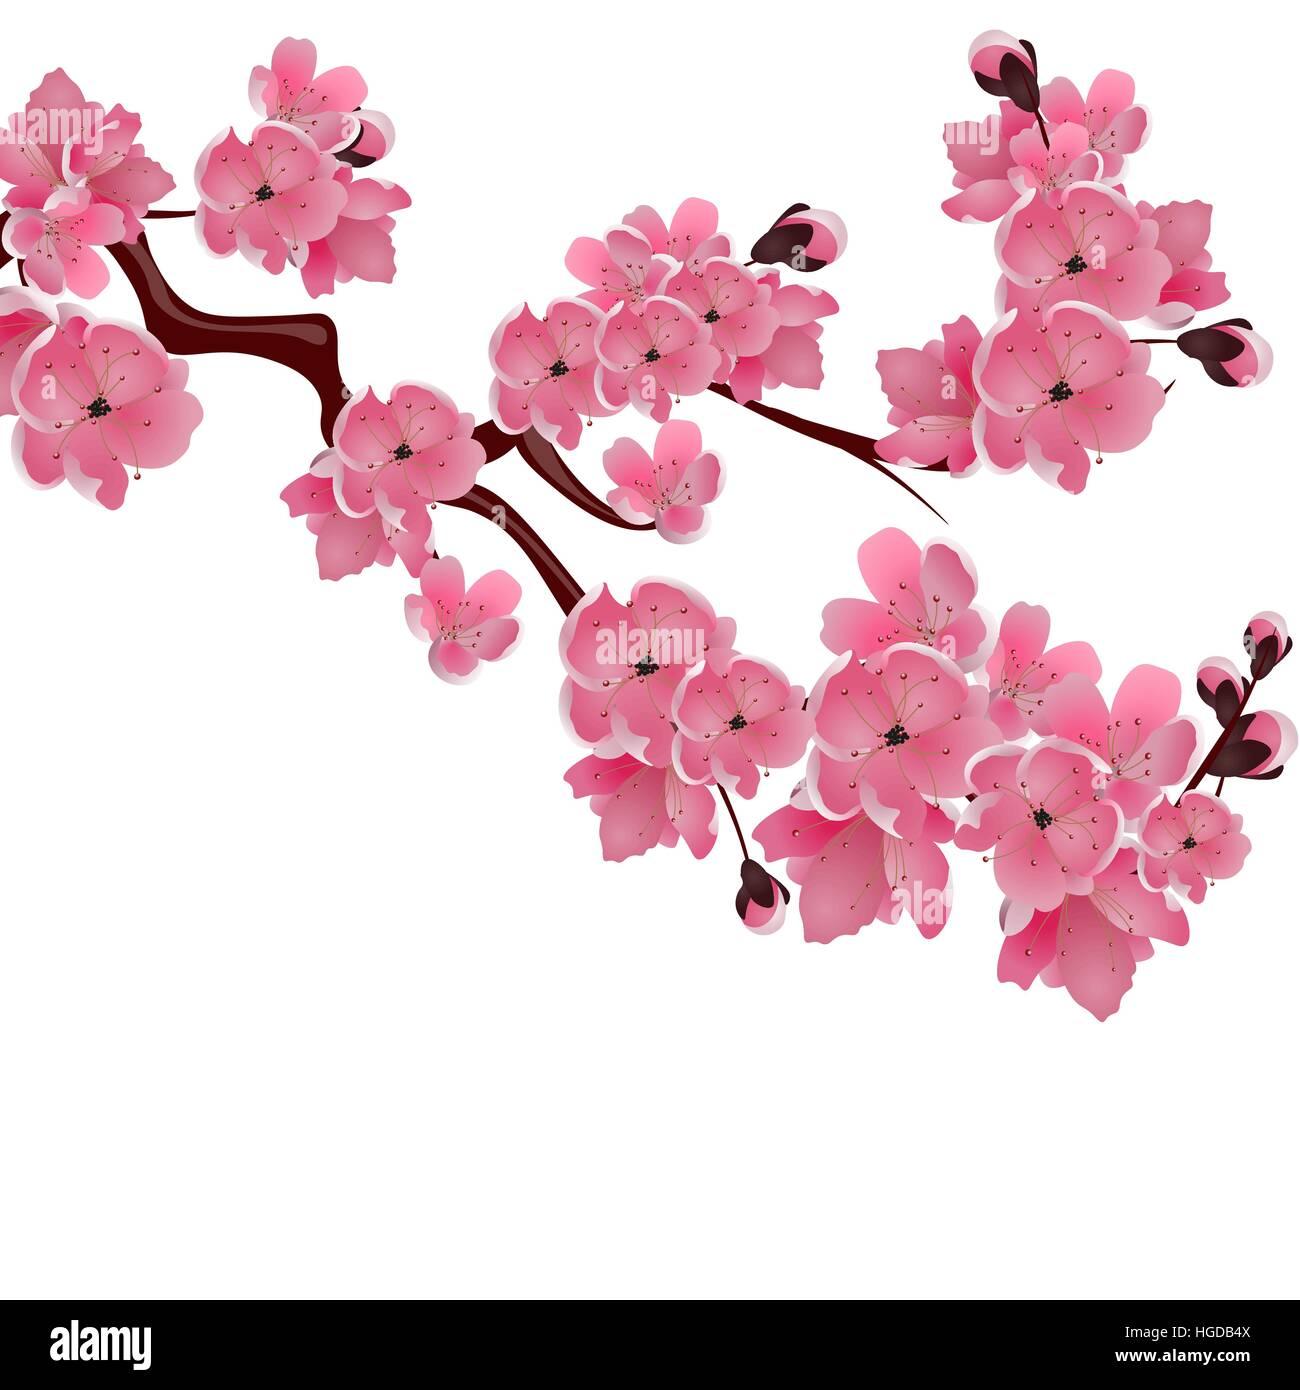 Flowering japanese cherry sprig of pink sakura blossoms isolated flowering japanese cherry sprig of pink sakura blossoms isolated white background illustration dhlflorist Images